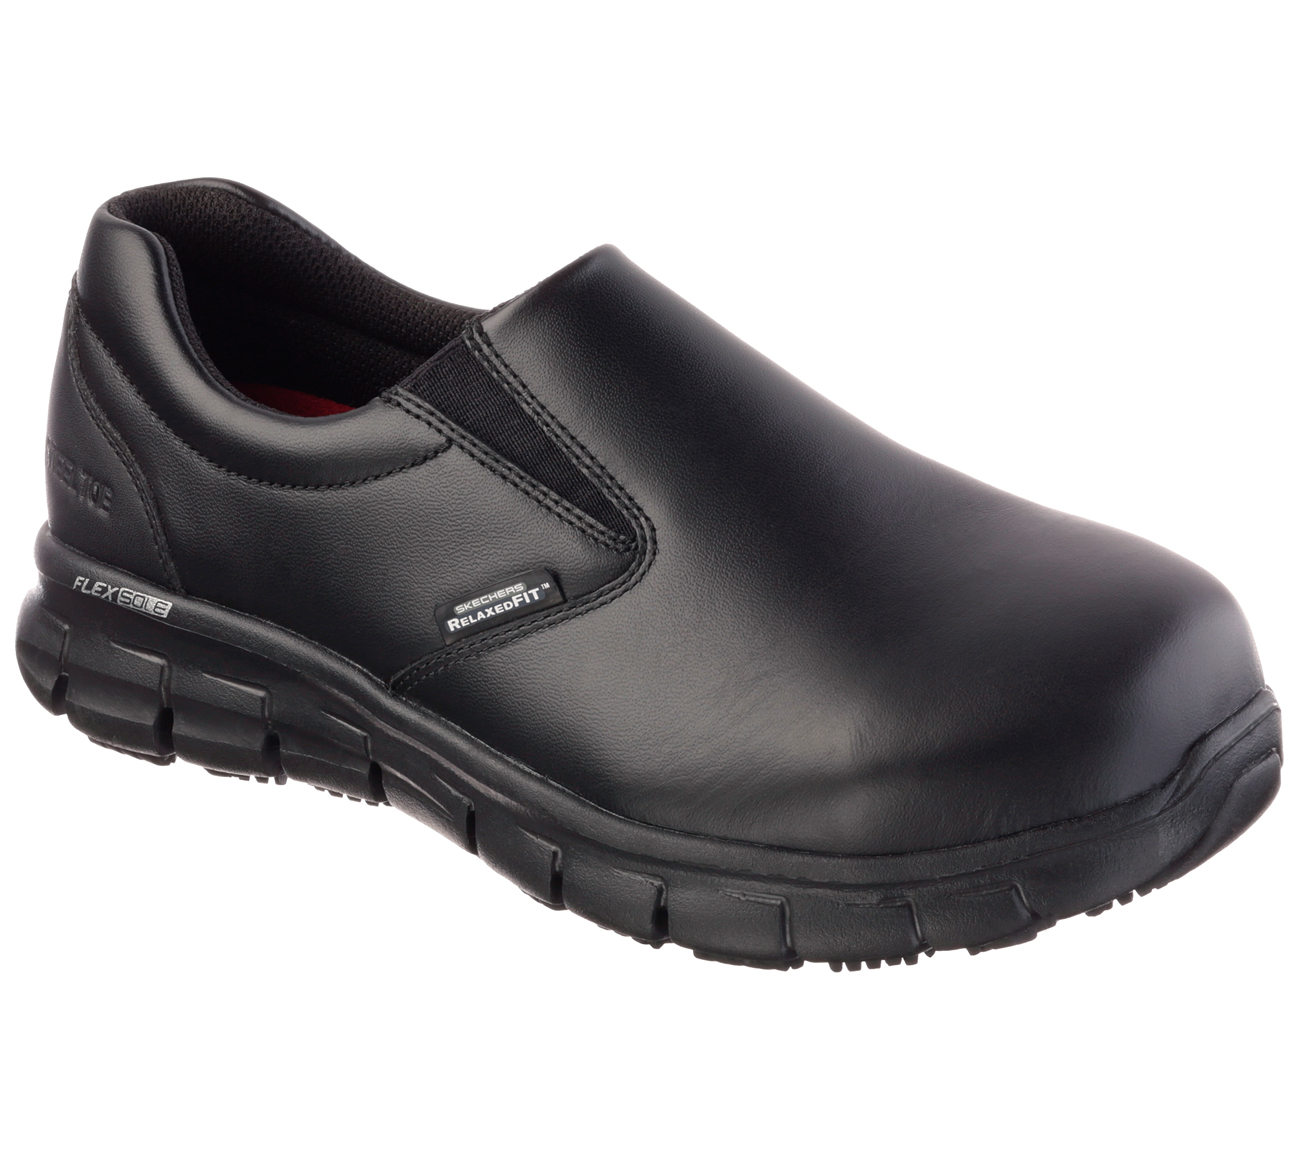 Skechers Men's Shoes Air-Cooled Geardo Memory Foam Comfort 50120 Size 12